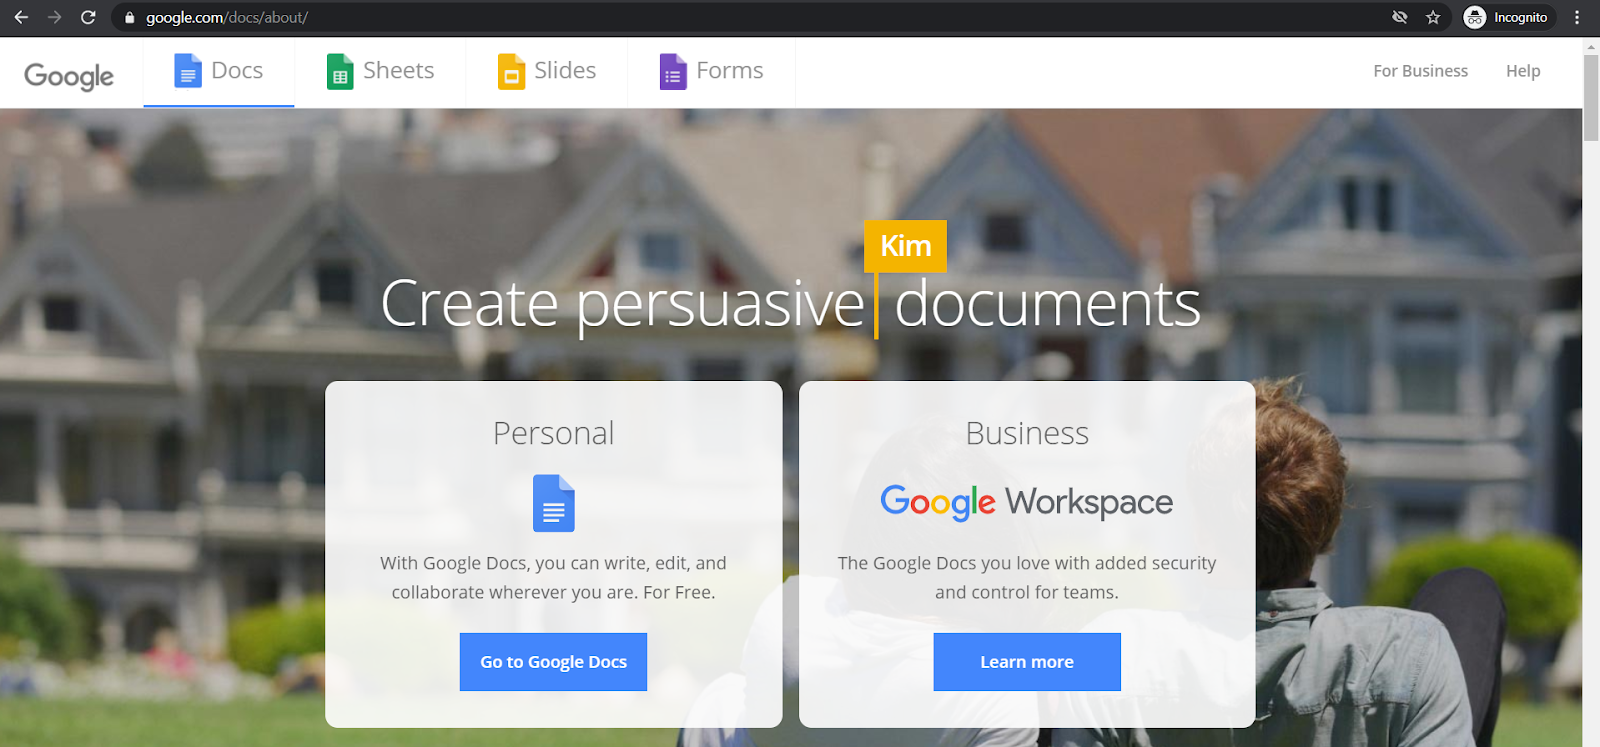 google docs homepage